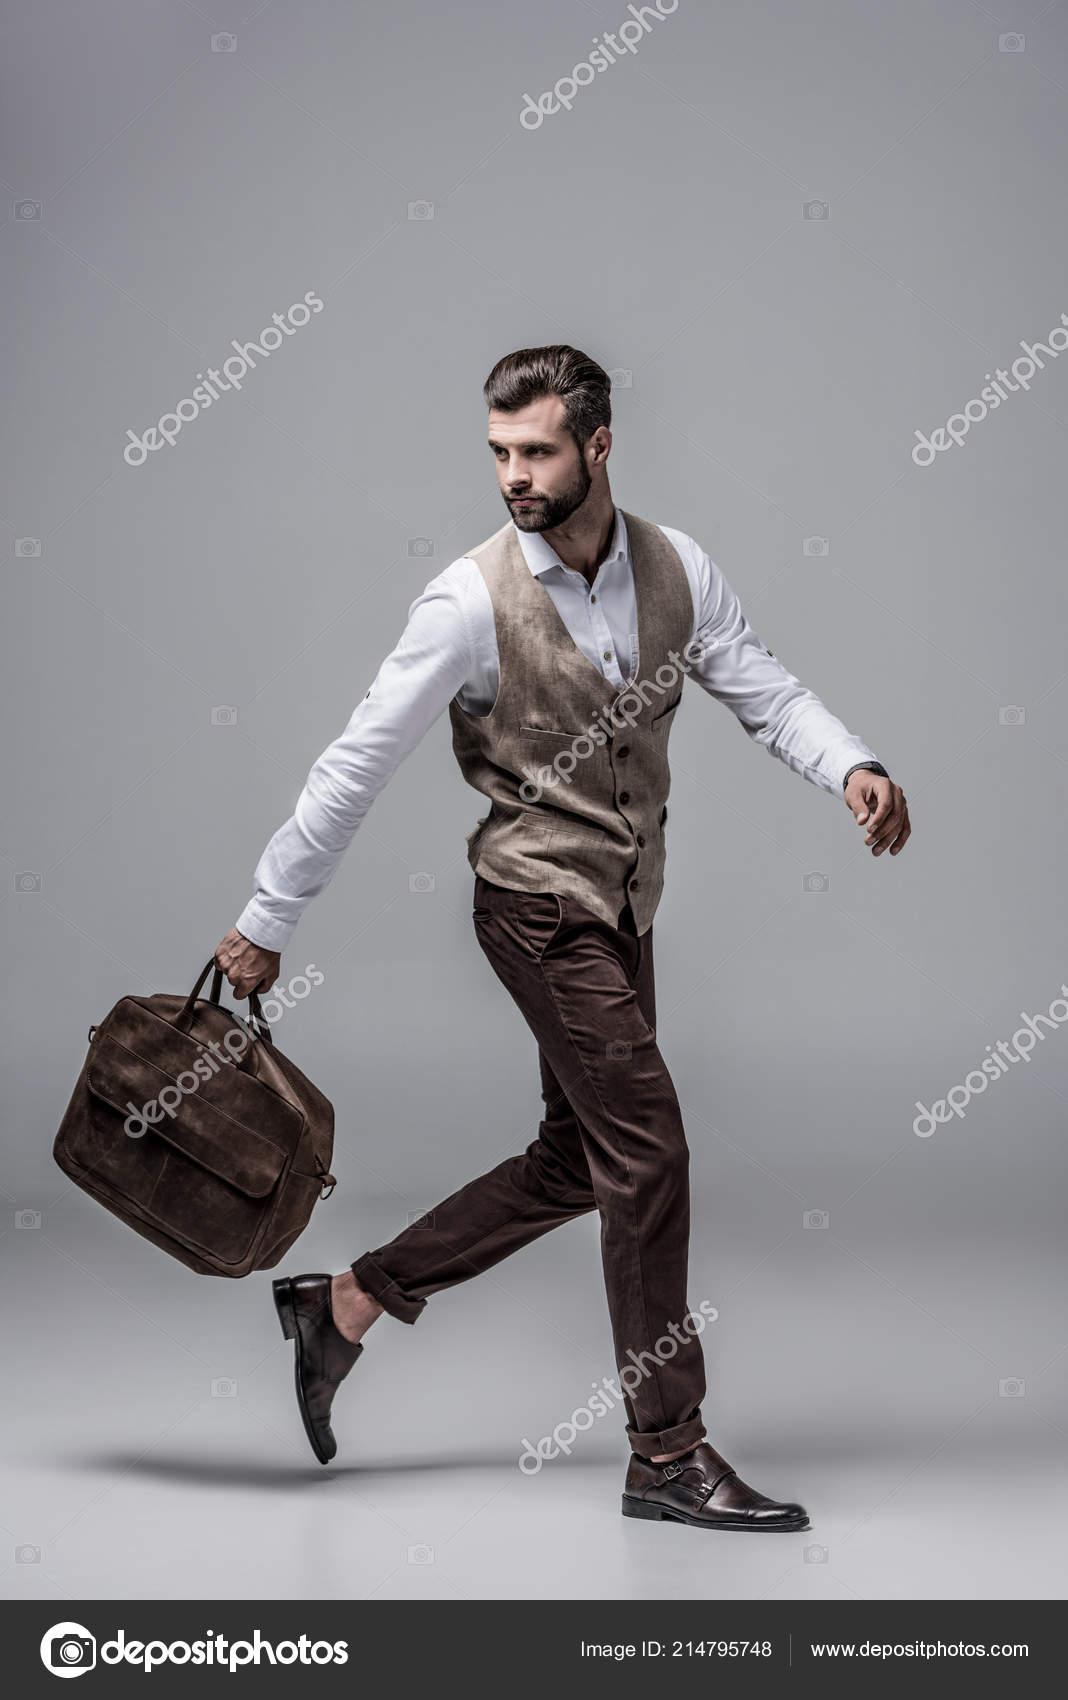 bastante agradable 49aa8 6a85e Hombre Elegante Apresura Corriendo Con Bolso Cuero Gris ...